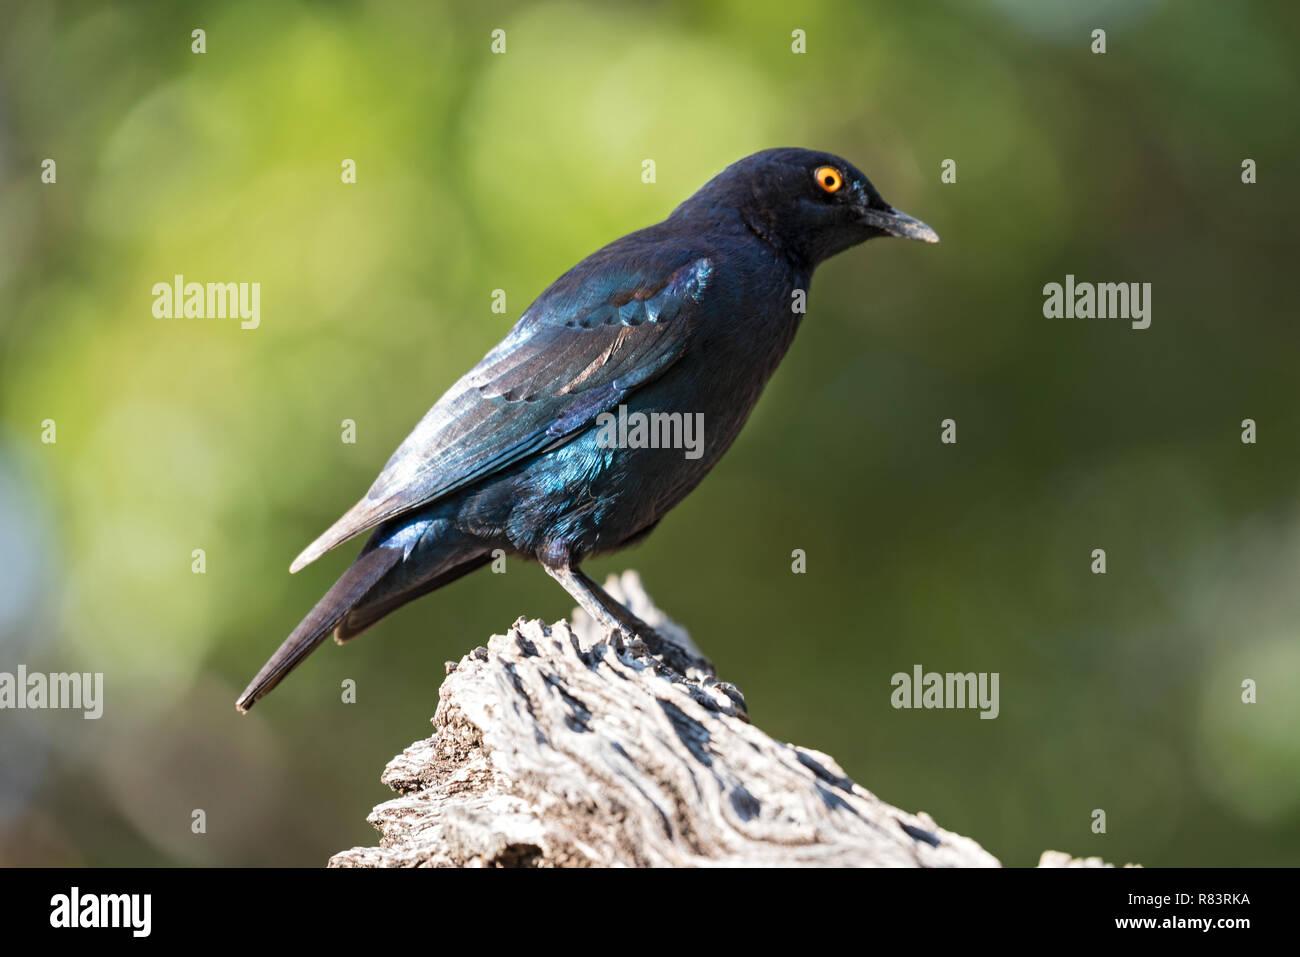 Kap glossy Starling (Lamprotornis nitens) auf eine Niederlassung in Namibia Stockbild